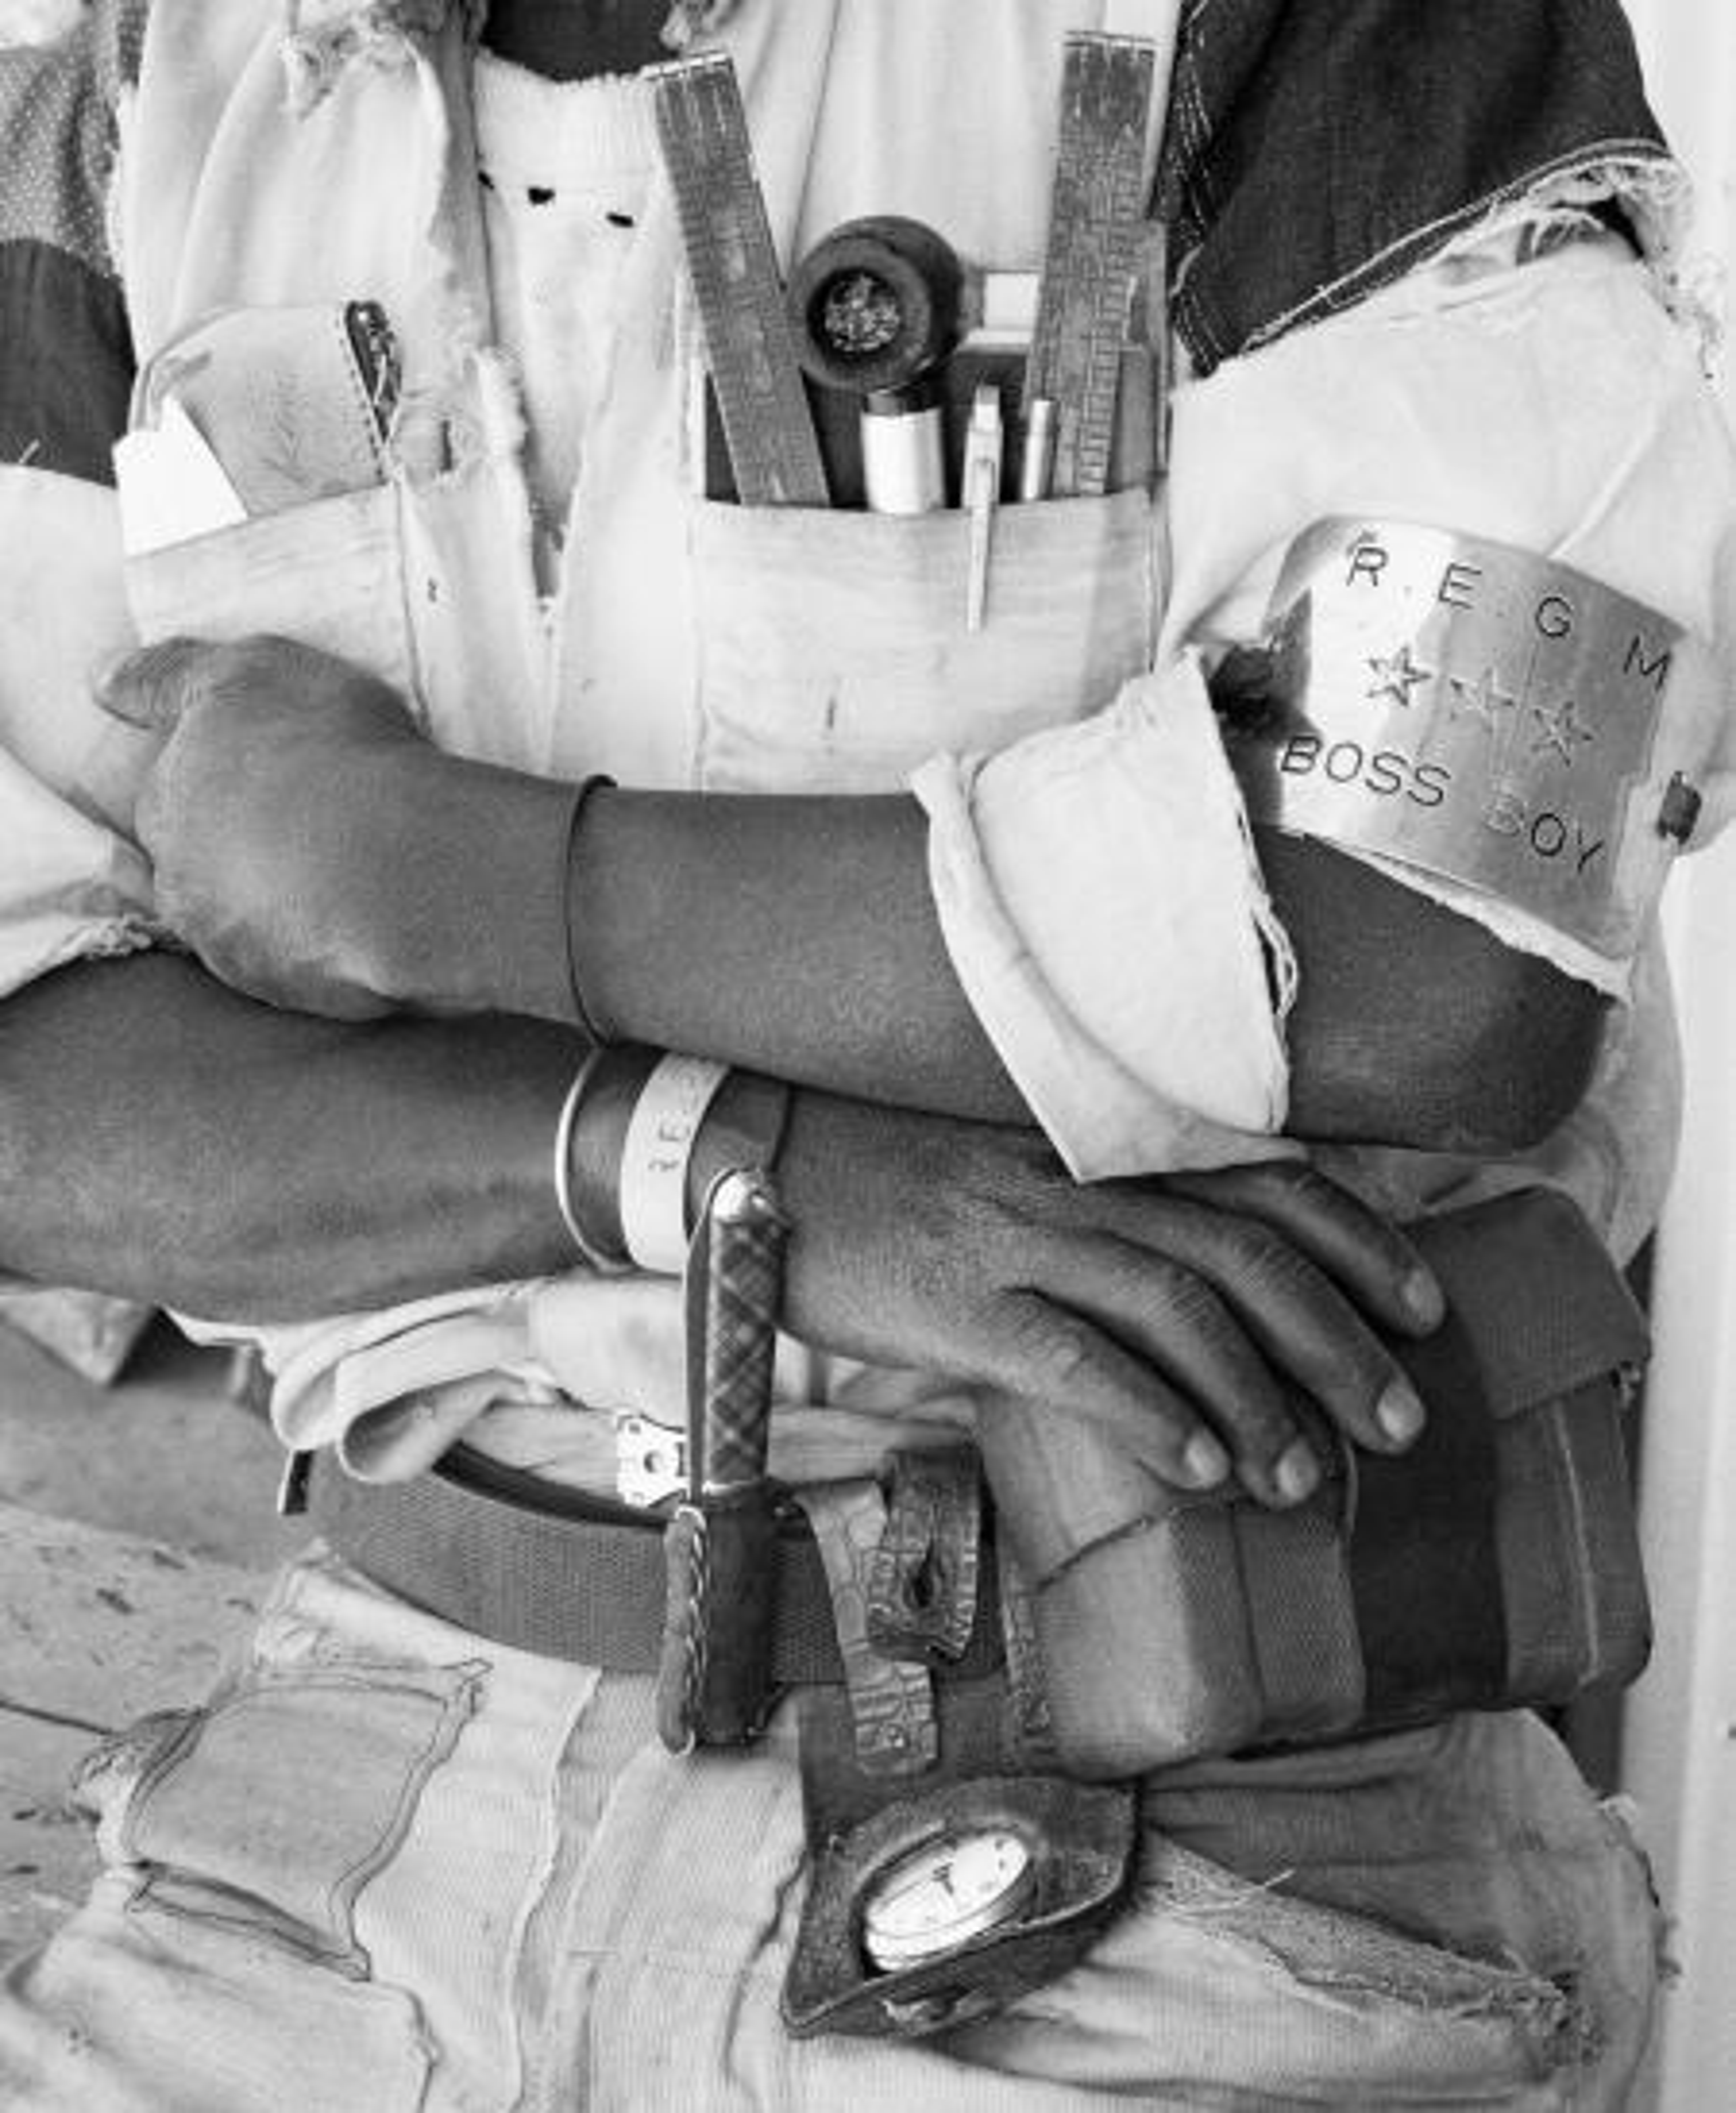 Photos: David Goldblatt, celebrated South African photographer, has died